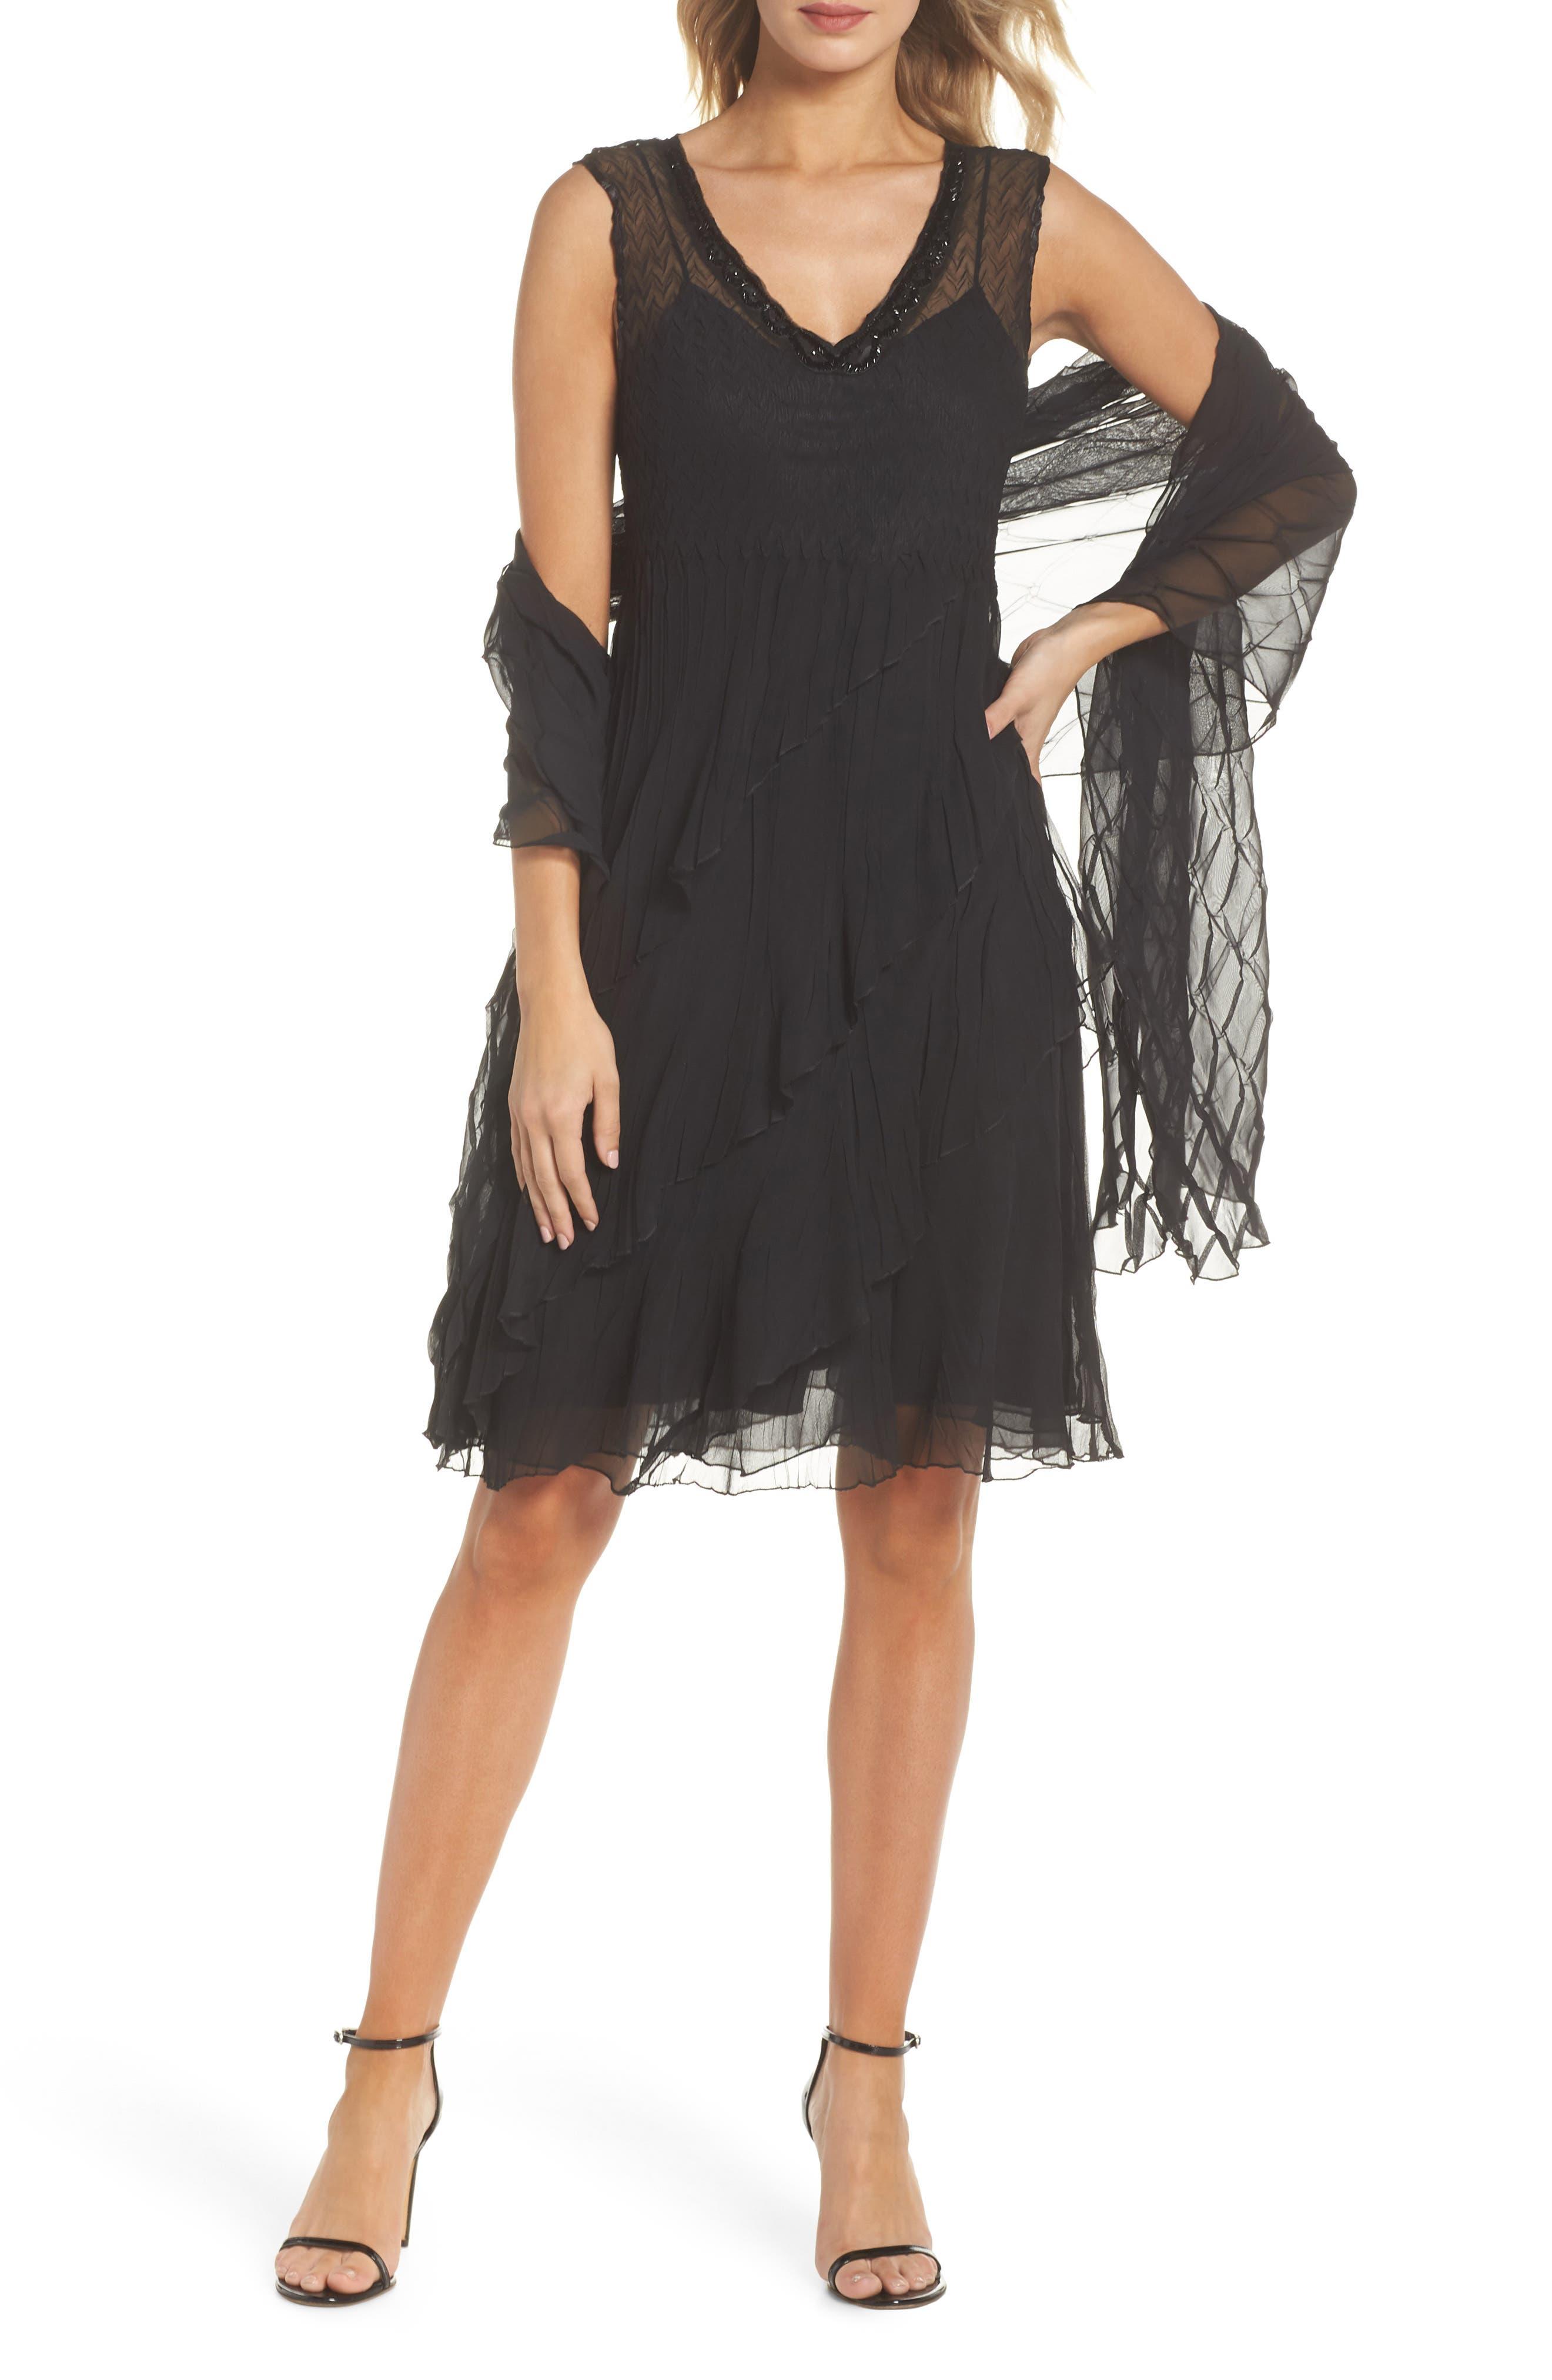 KOMAROV Bead Trim Chiffon Dress with Wrap, Main, color, BLACK